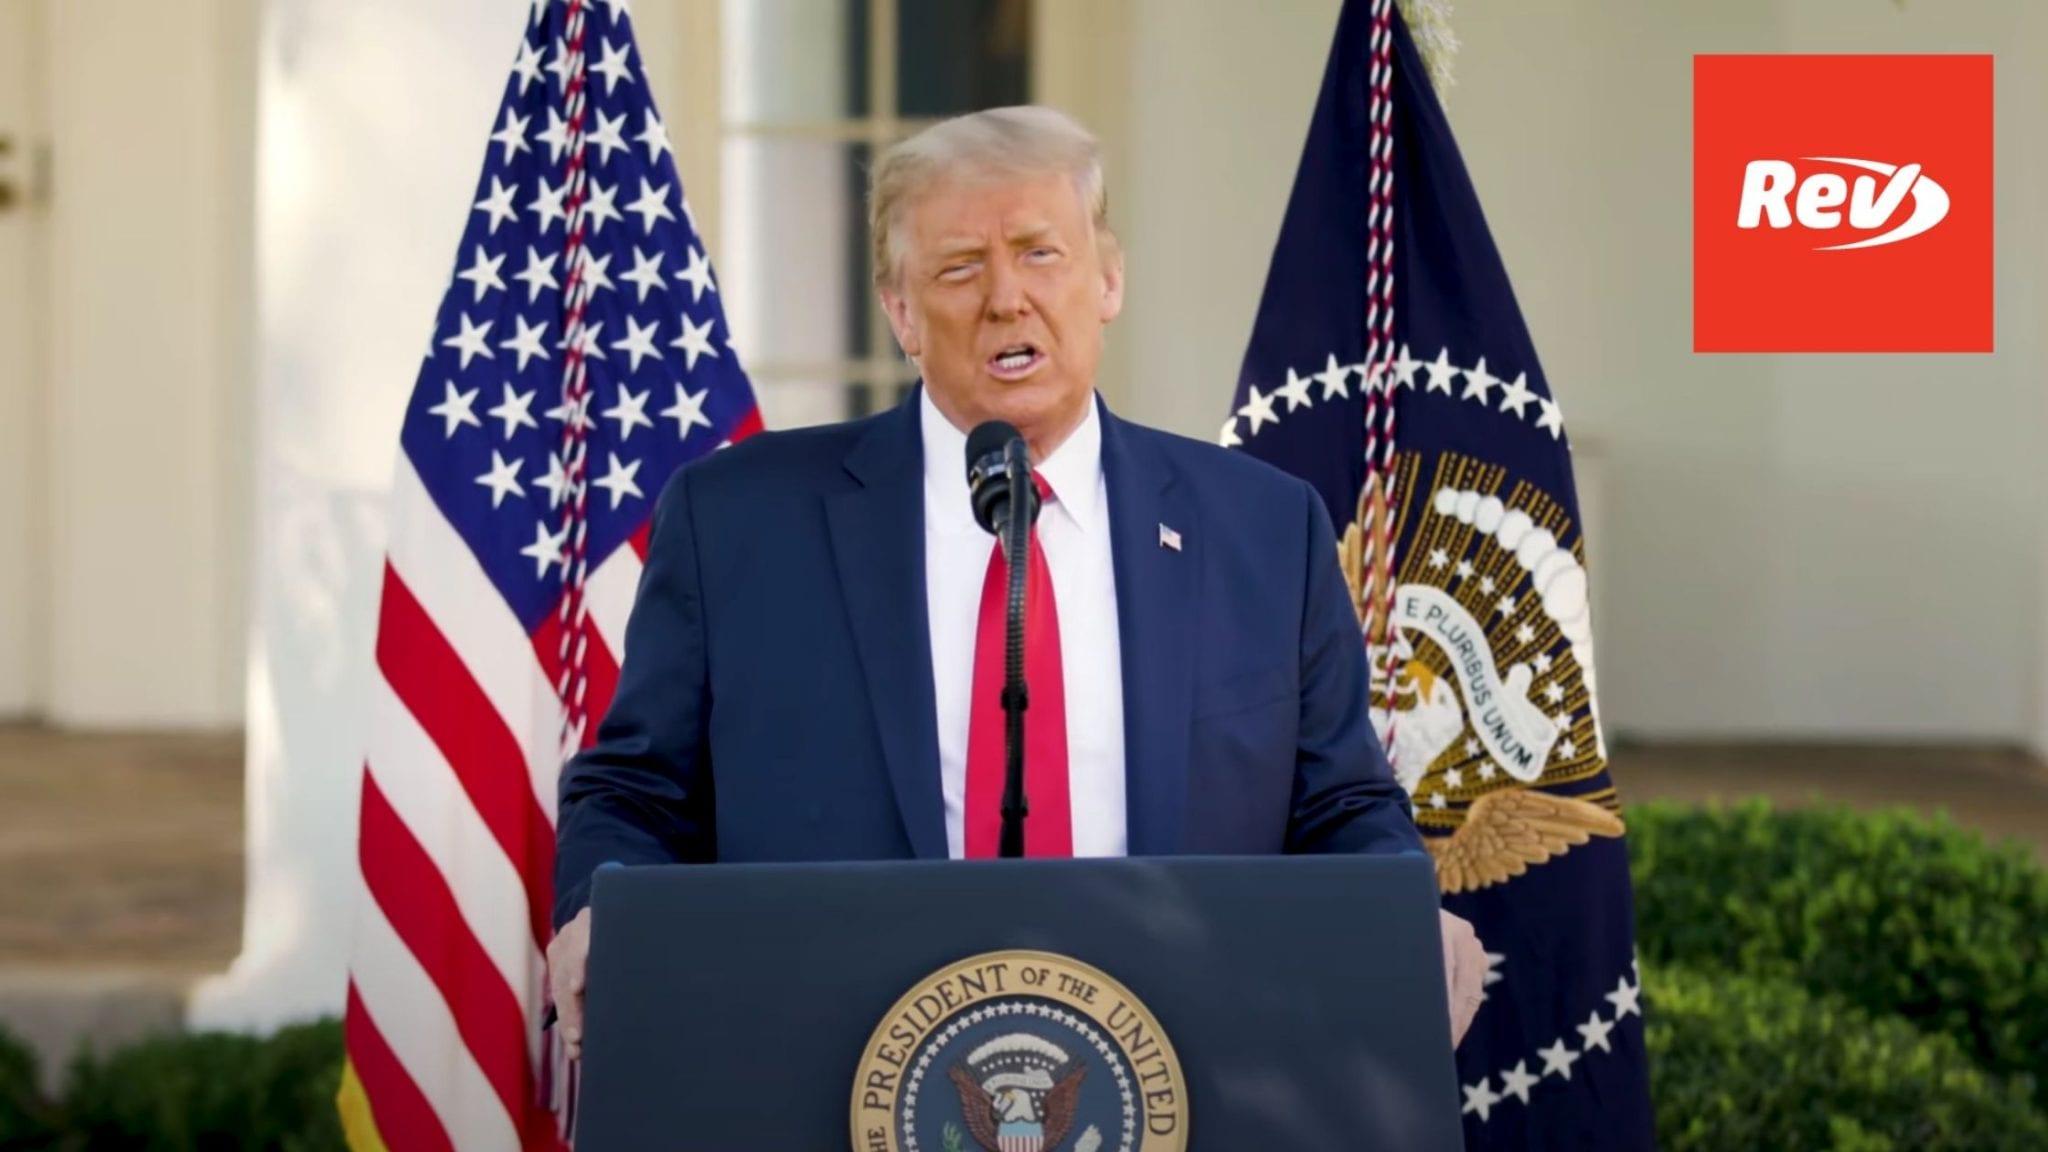 Donald Trump Addresses Economic Club of New York Transcript October 14